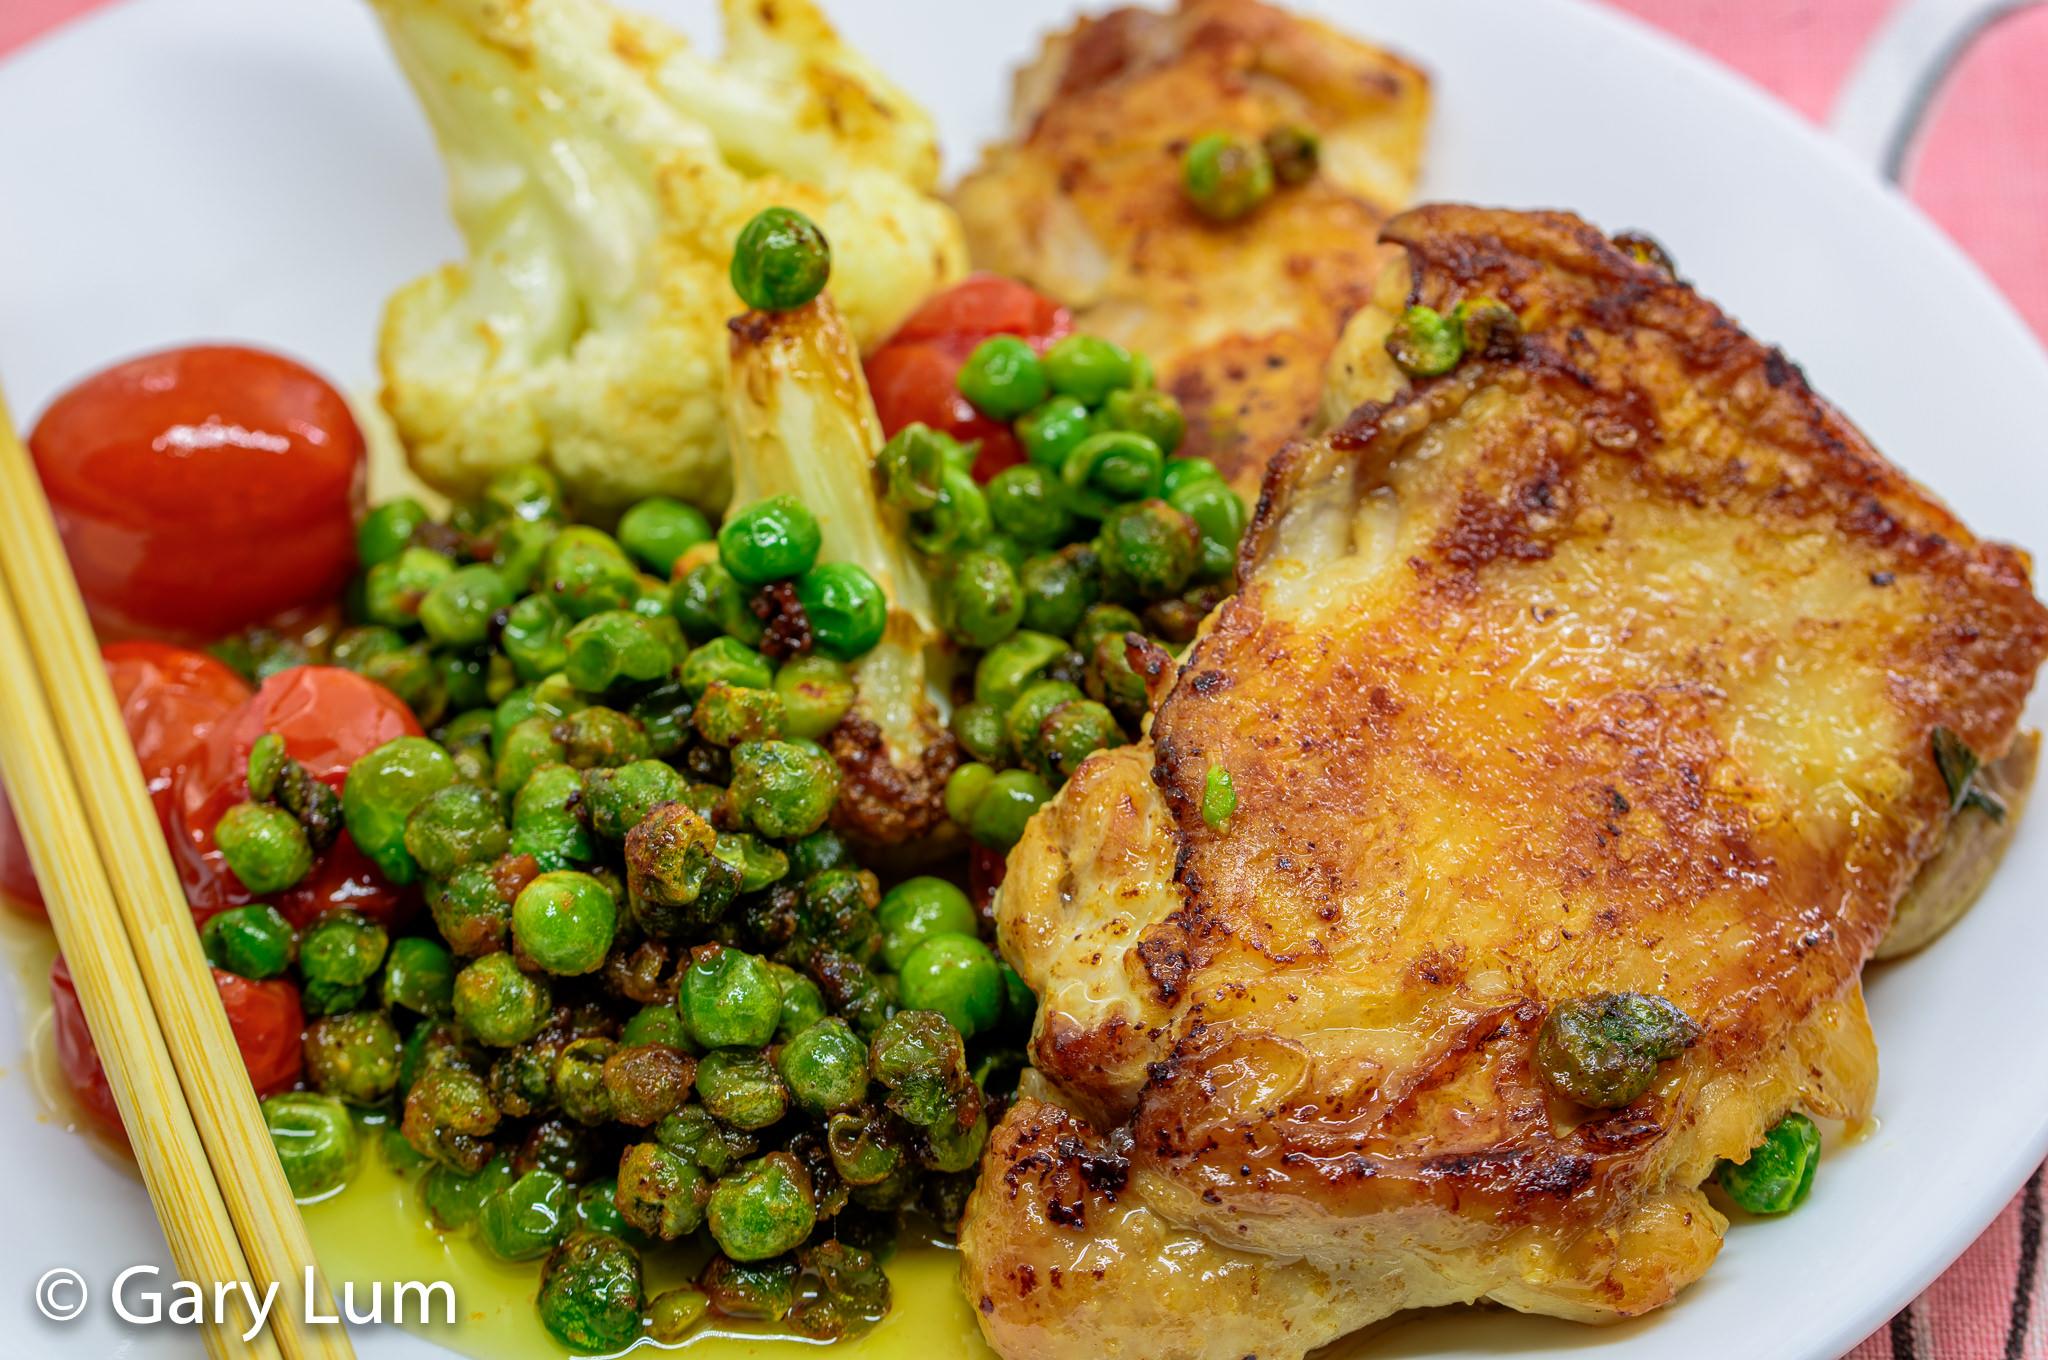 Close up. Pan-fried boneless chicken and vegetables. Gary Lum.